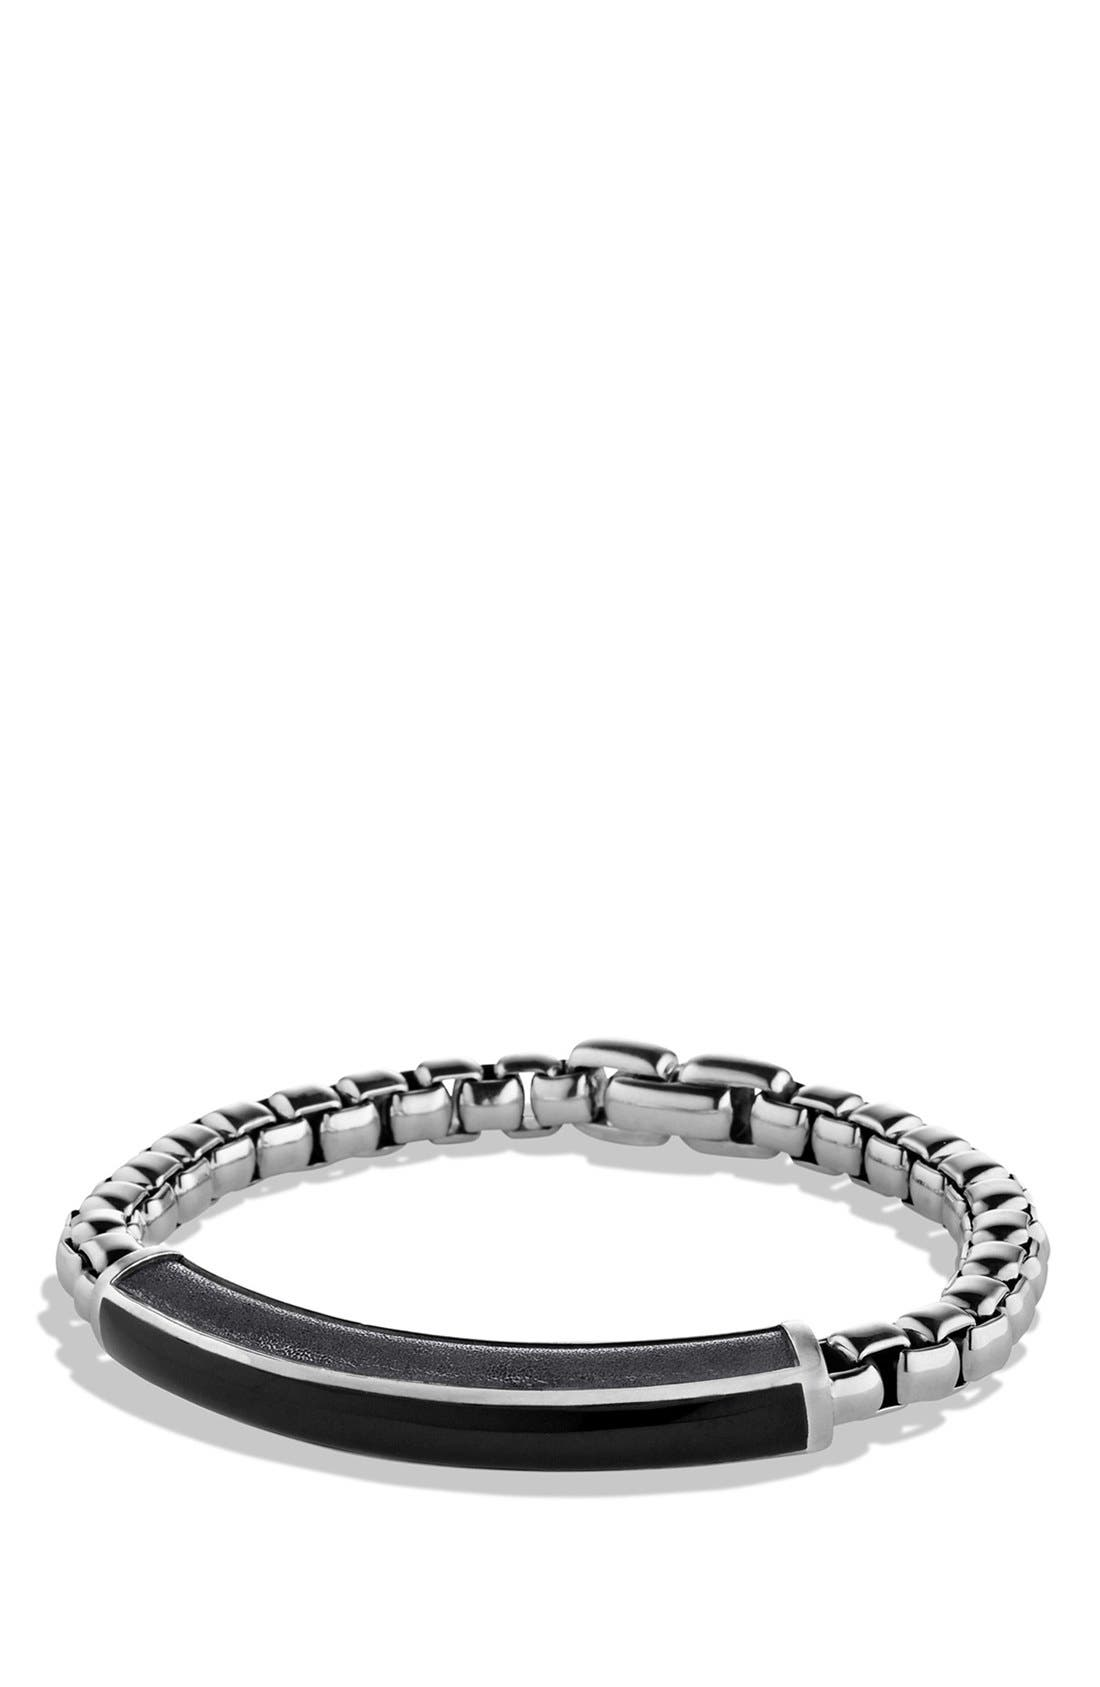 David Yurman 'Exotic Stone' ID Bracelet